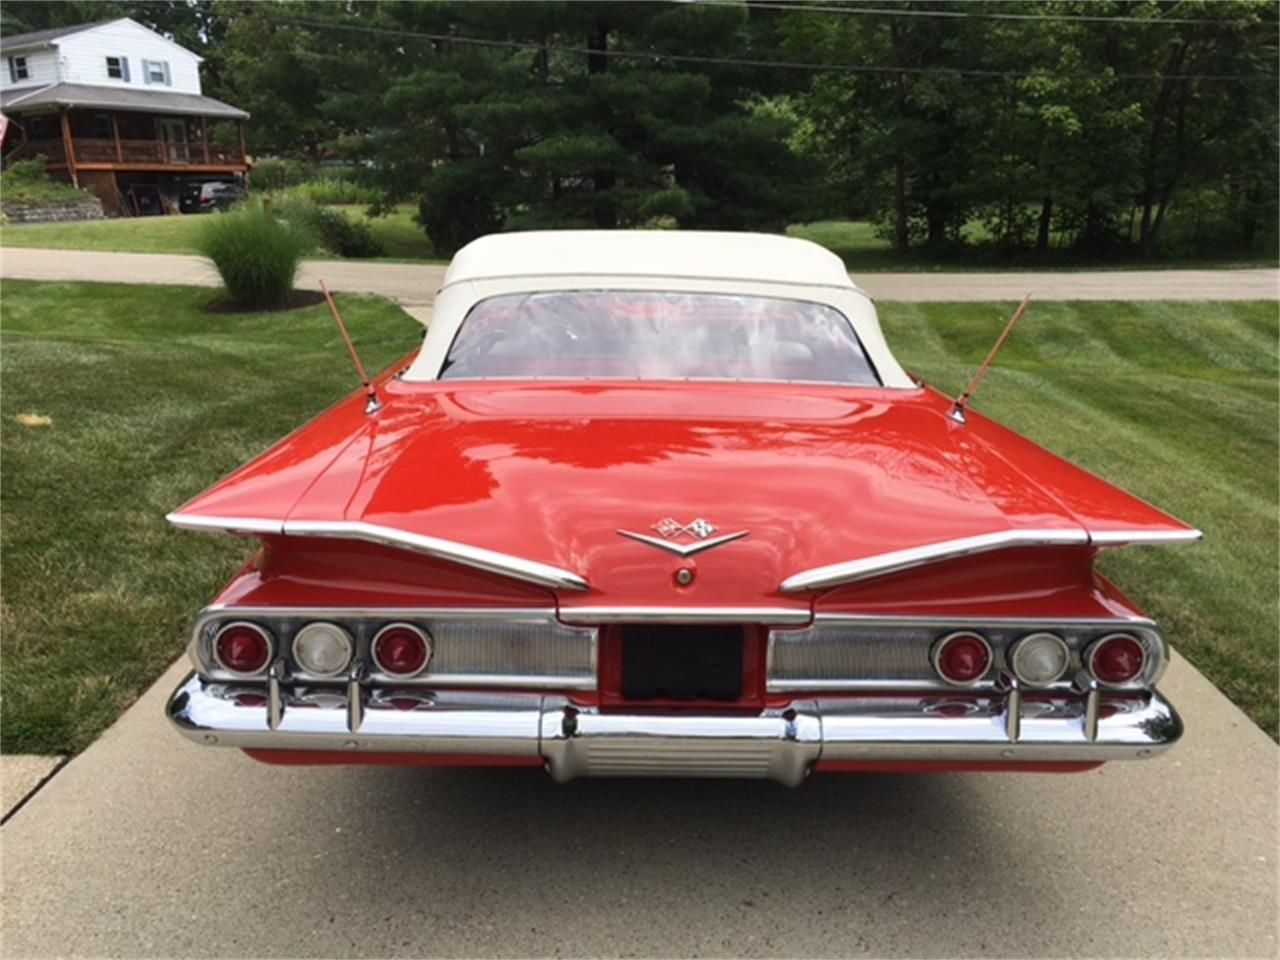 1956 chevrolet belair mjc classic cars pristine - 1960 Chevrolet Impala Ss 348 Ci V8 Tri Power 280 Hp